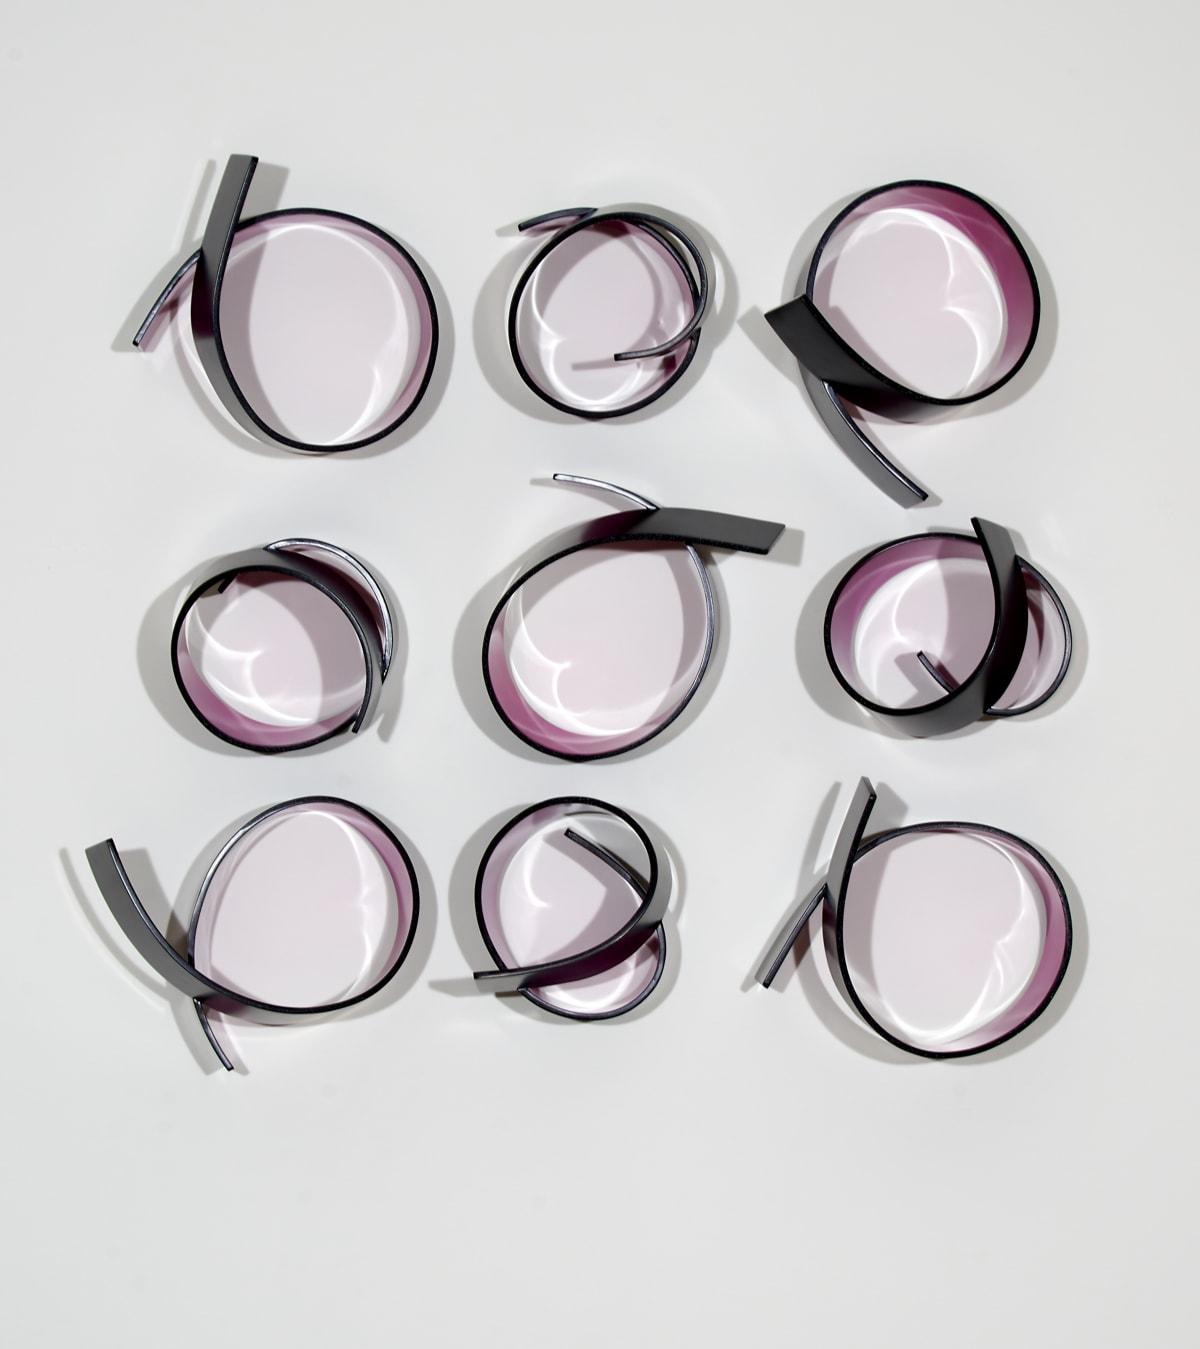 Marion Borgelt Full Circle Fuchsia No 1 (9 pieces), 2019 bending ply, polyurethane, laminate 76 x 80 x 19.5 cm